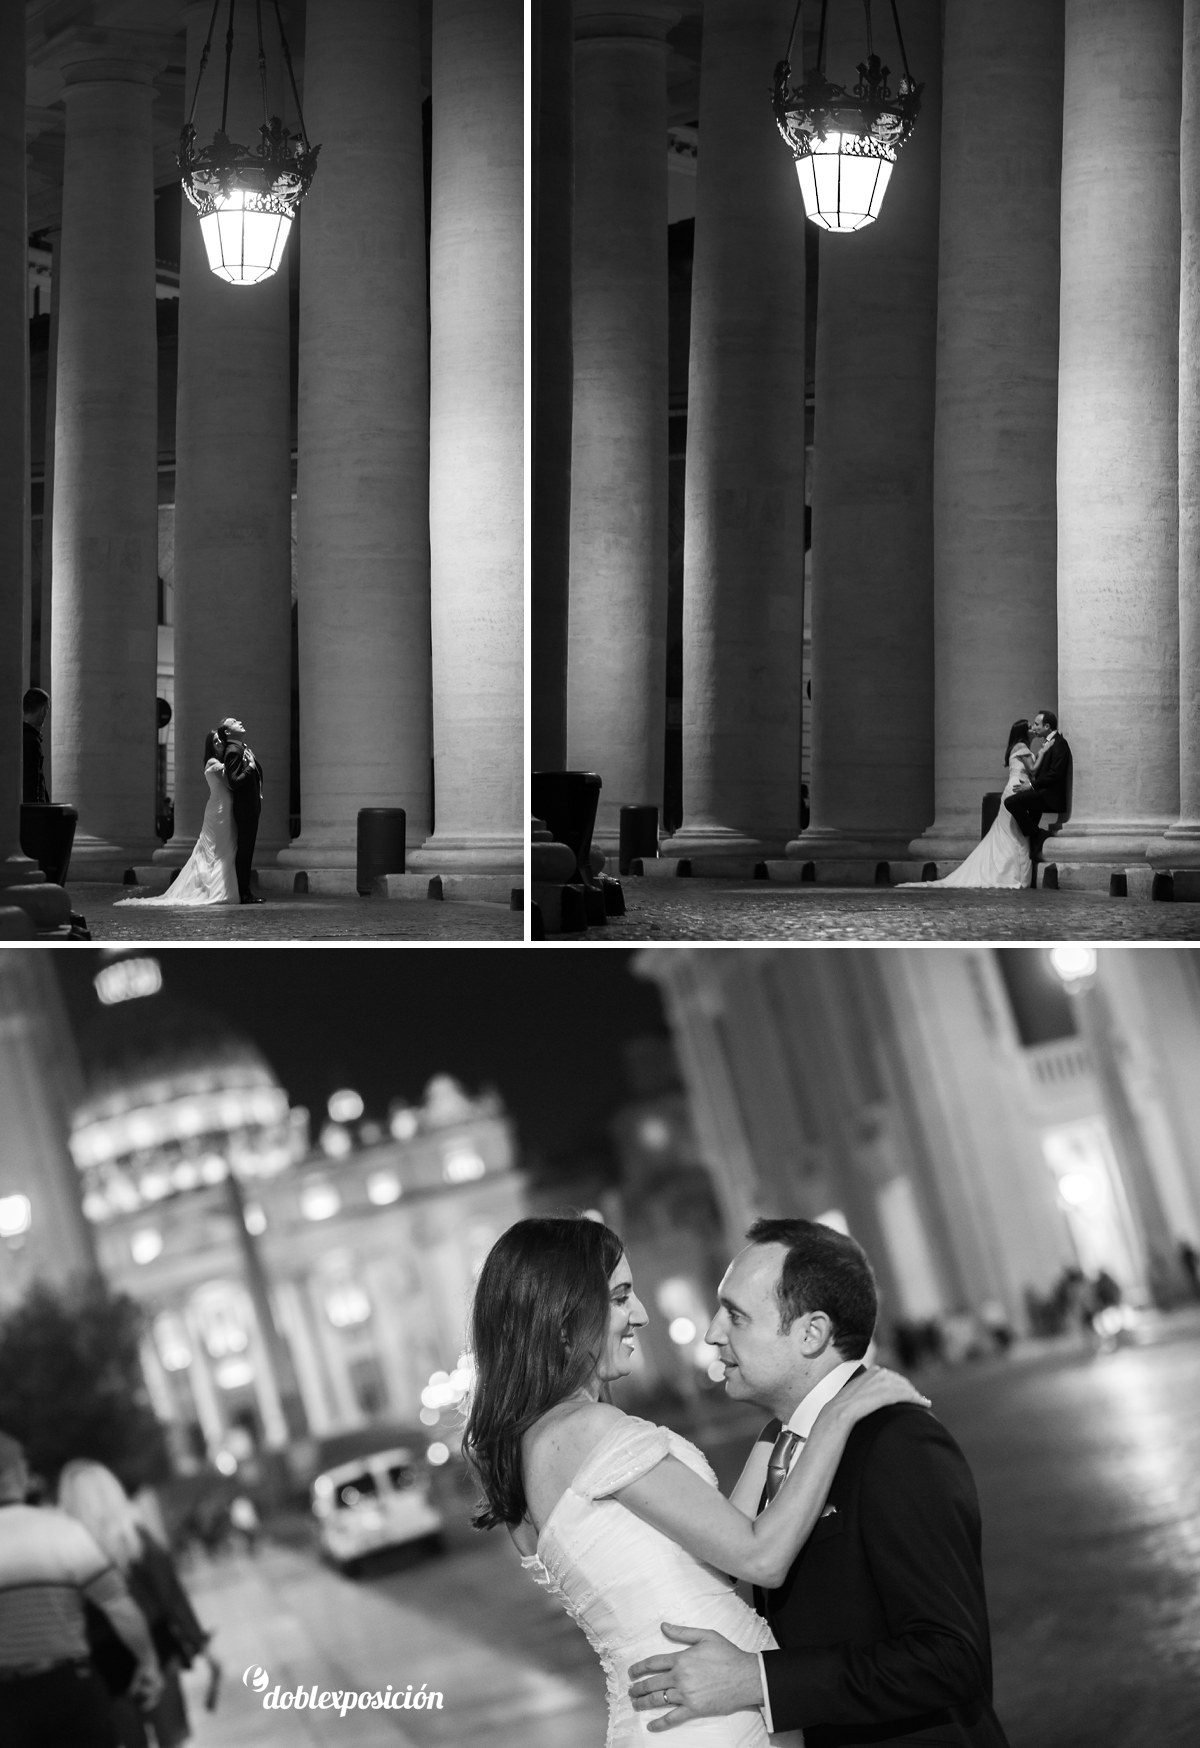 fotografos-boda-postboda-italia-roma-ciudad-eterna_0003